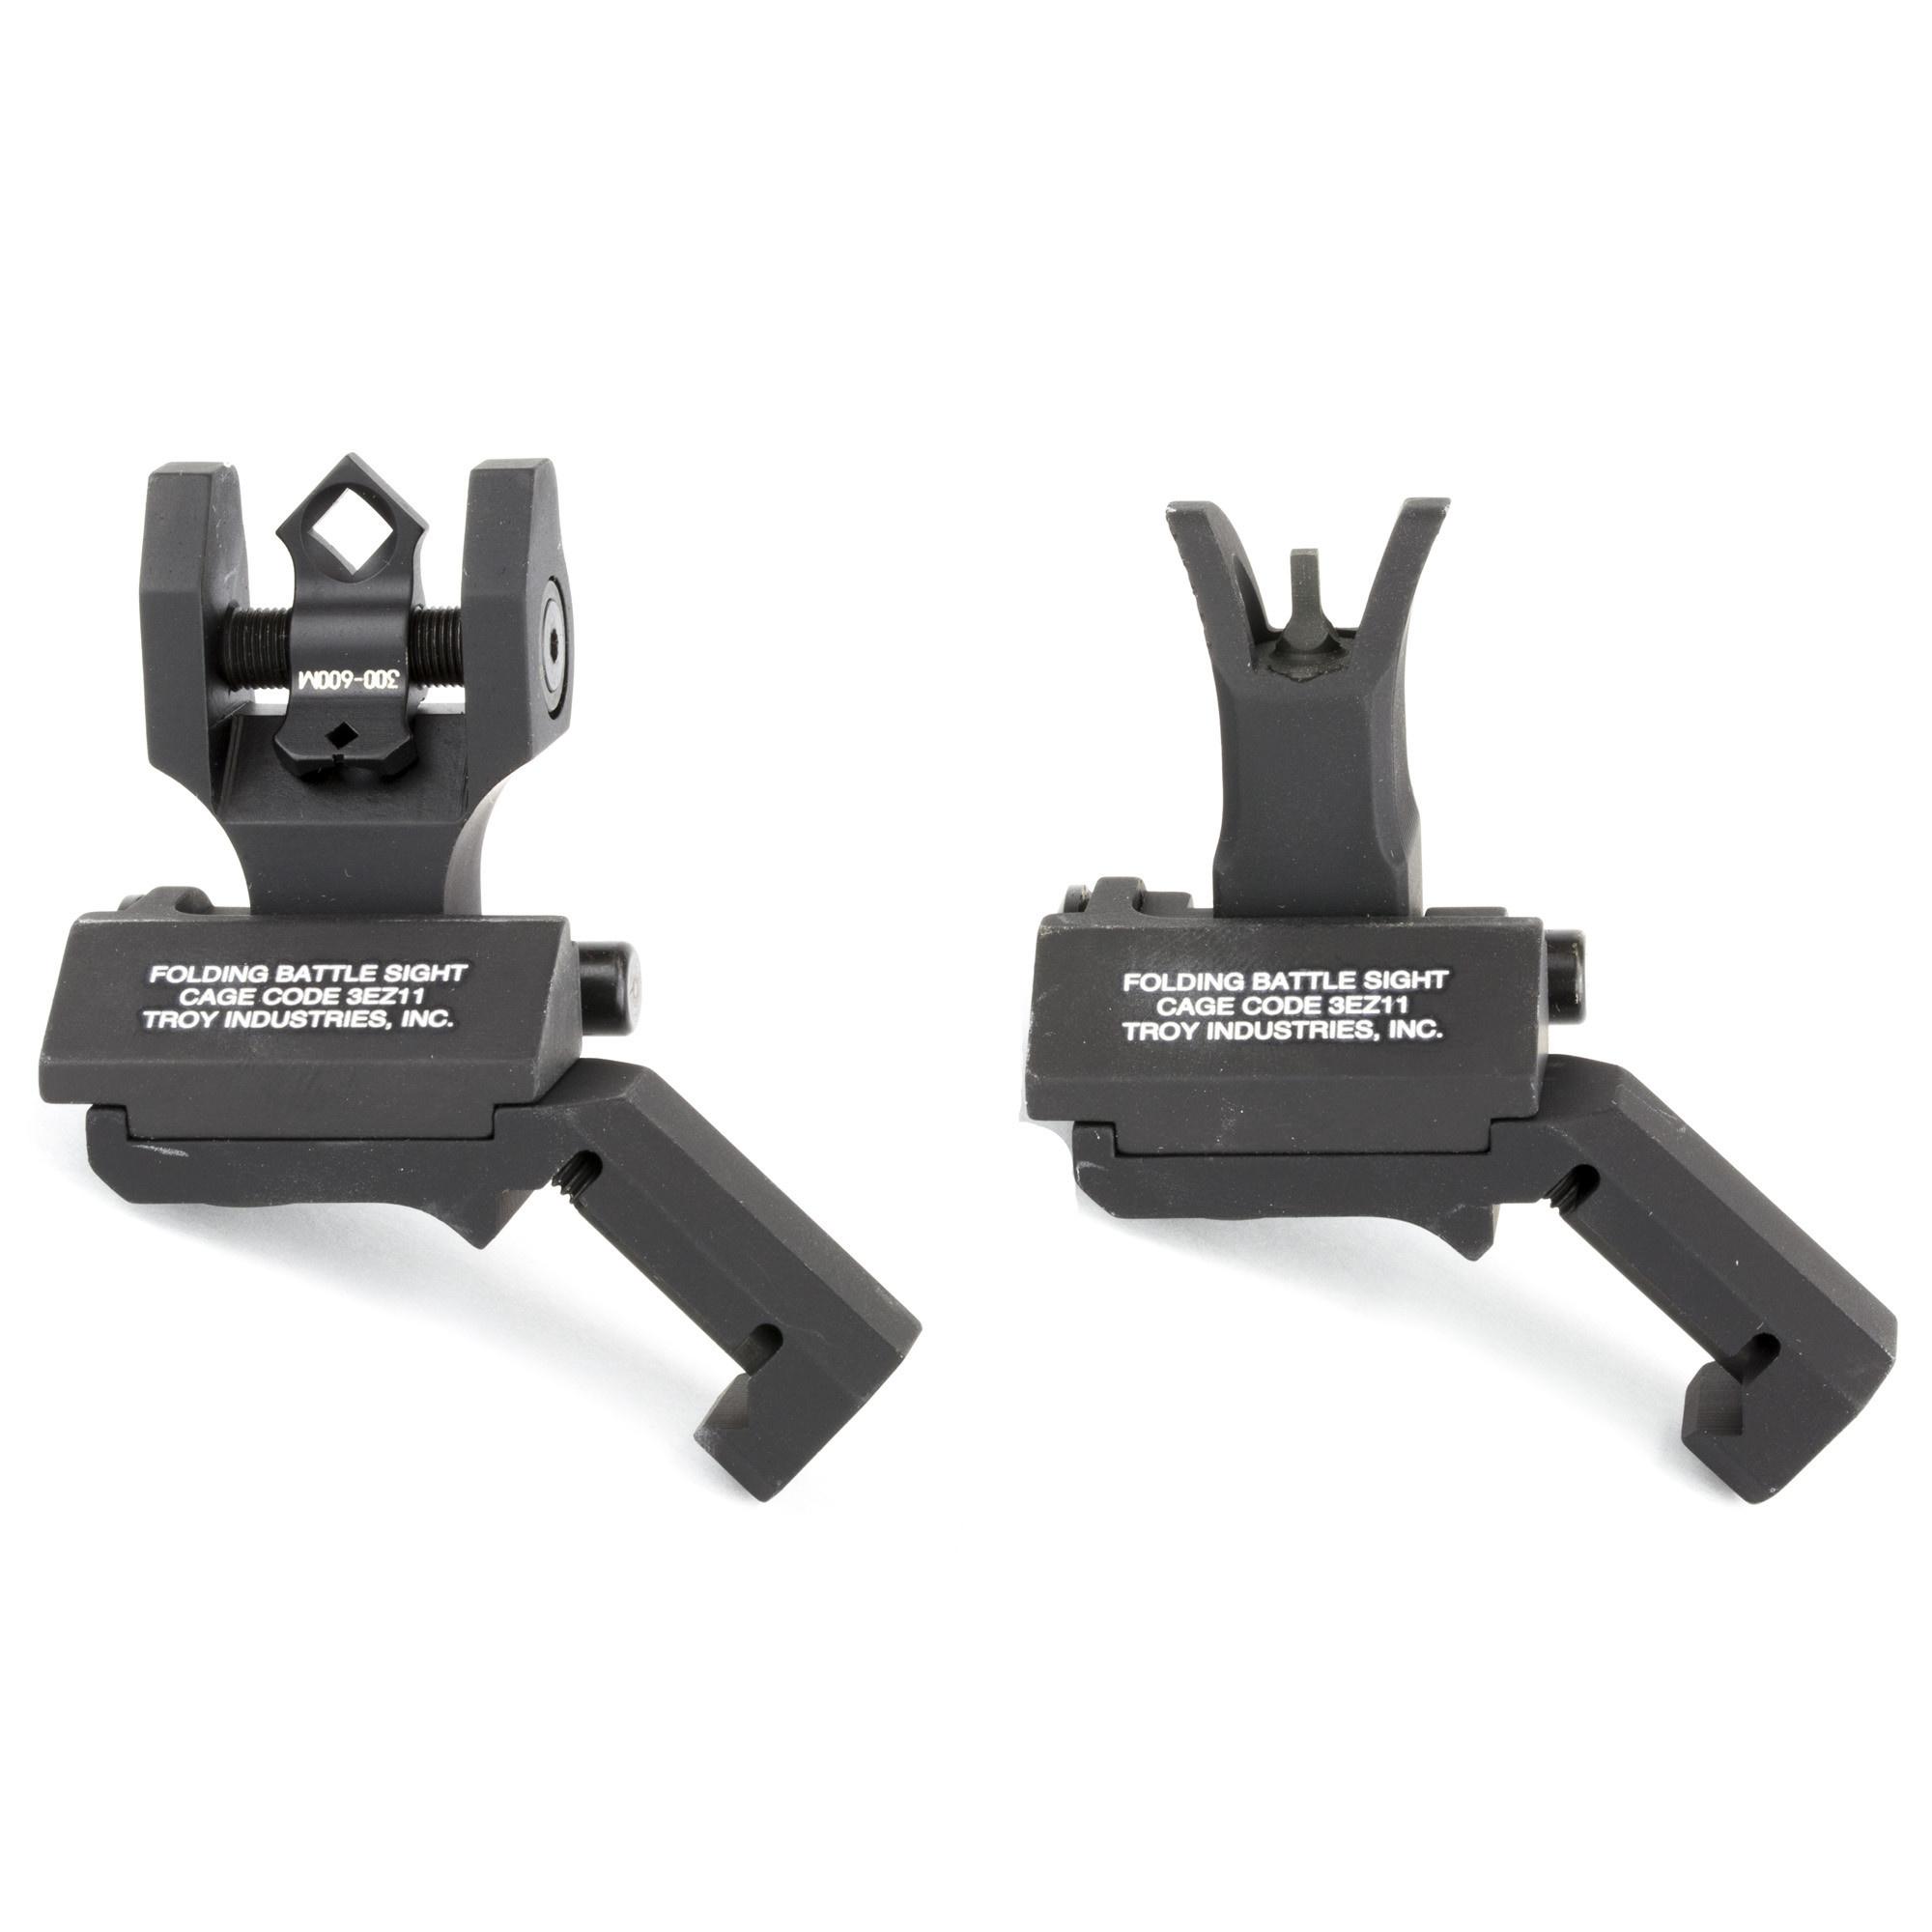 Troy Folding Offset Sights M4/Di-Optic